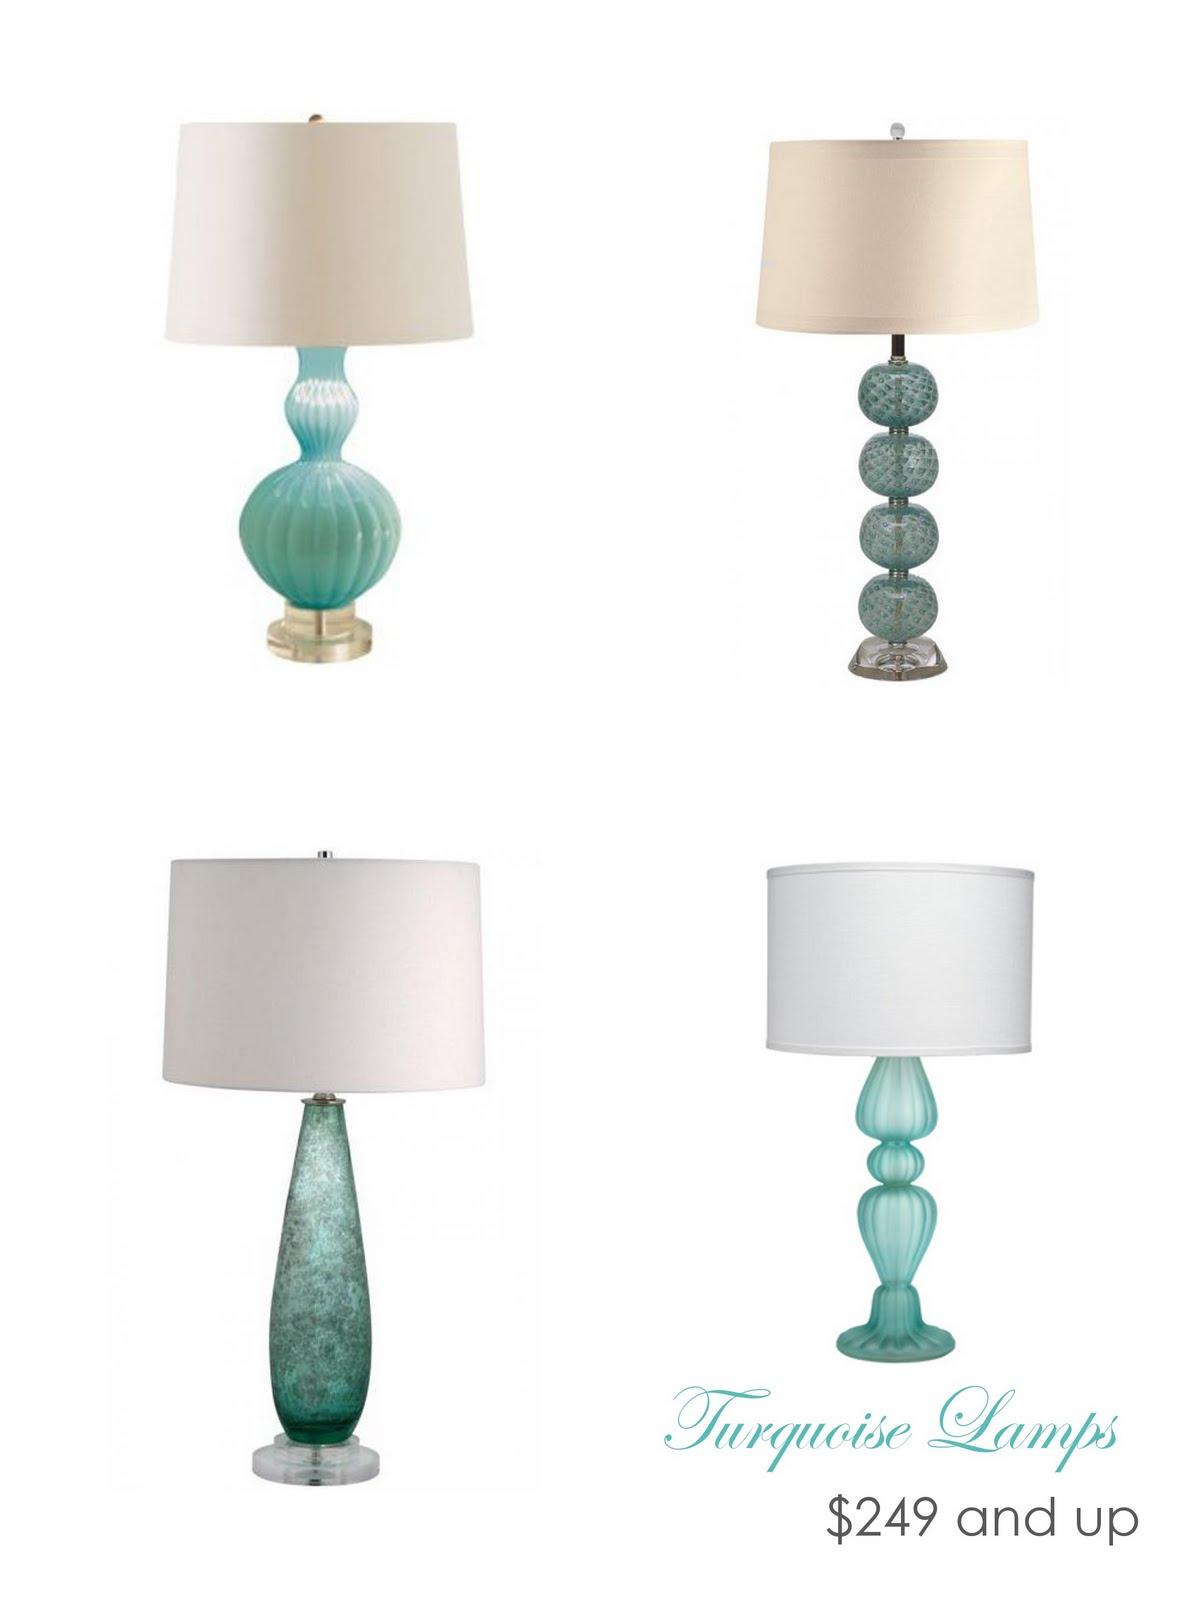 j hunt lamps bedroom jhunt home crystal floor lamp with j hunt  - lamps available here here here and here j hunt home table